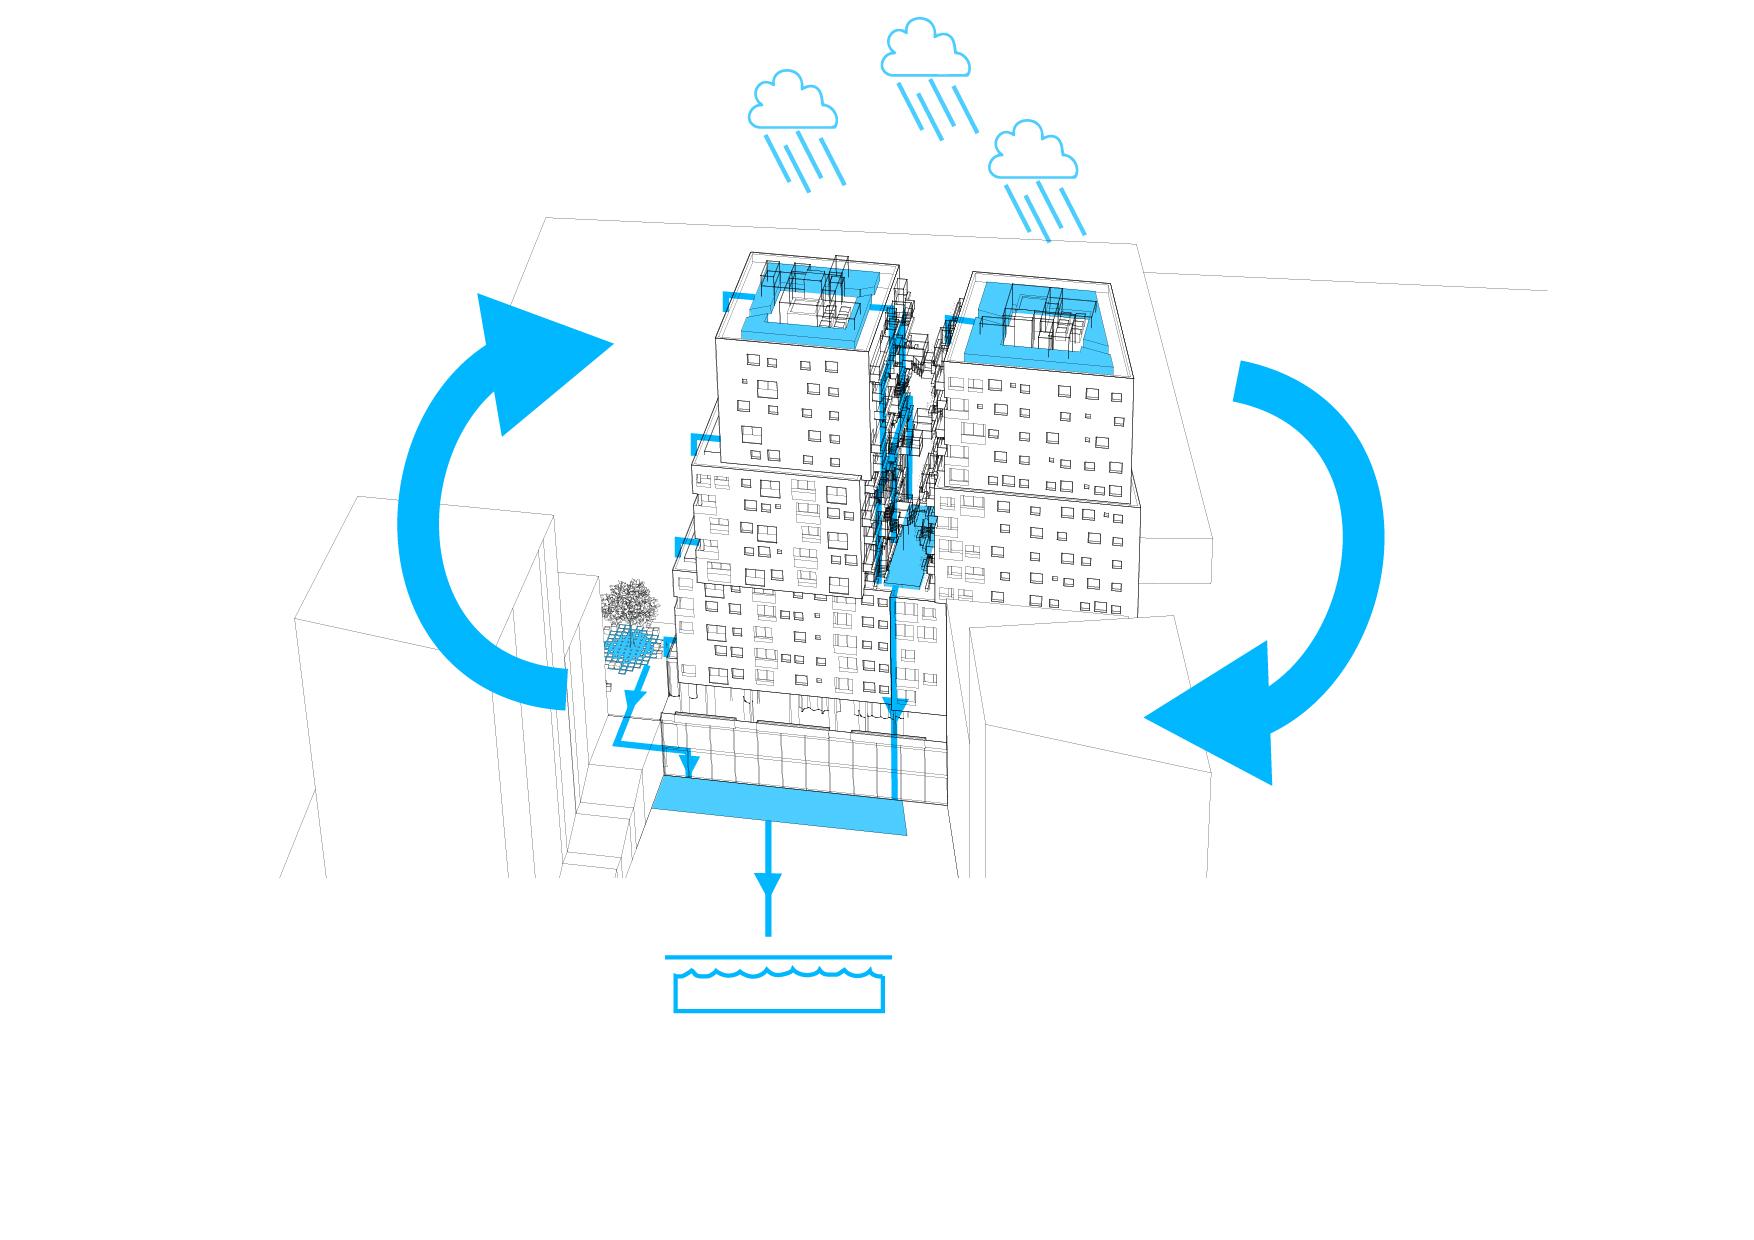 AR architectes Studio d'architectures Art & Build lan kaufman borad B1A3 semapa bruneseau massena (15).jpg